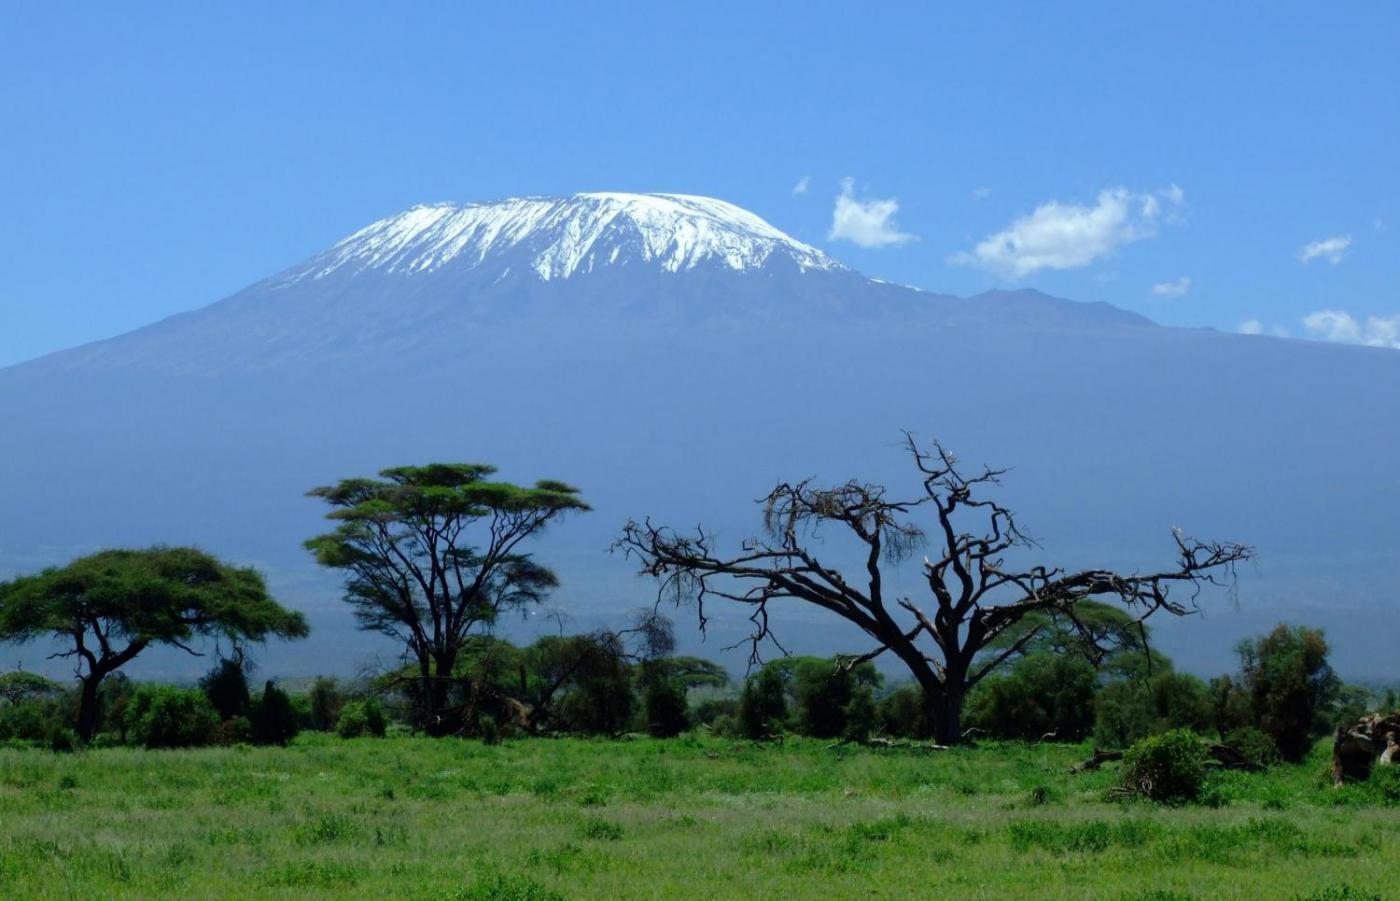 Mighty Kilimanjaro Lemosho Rt.